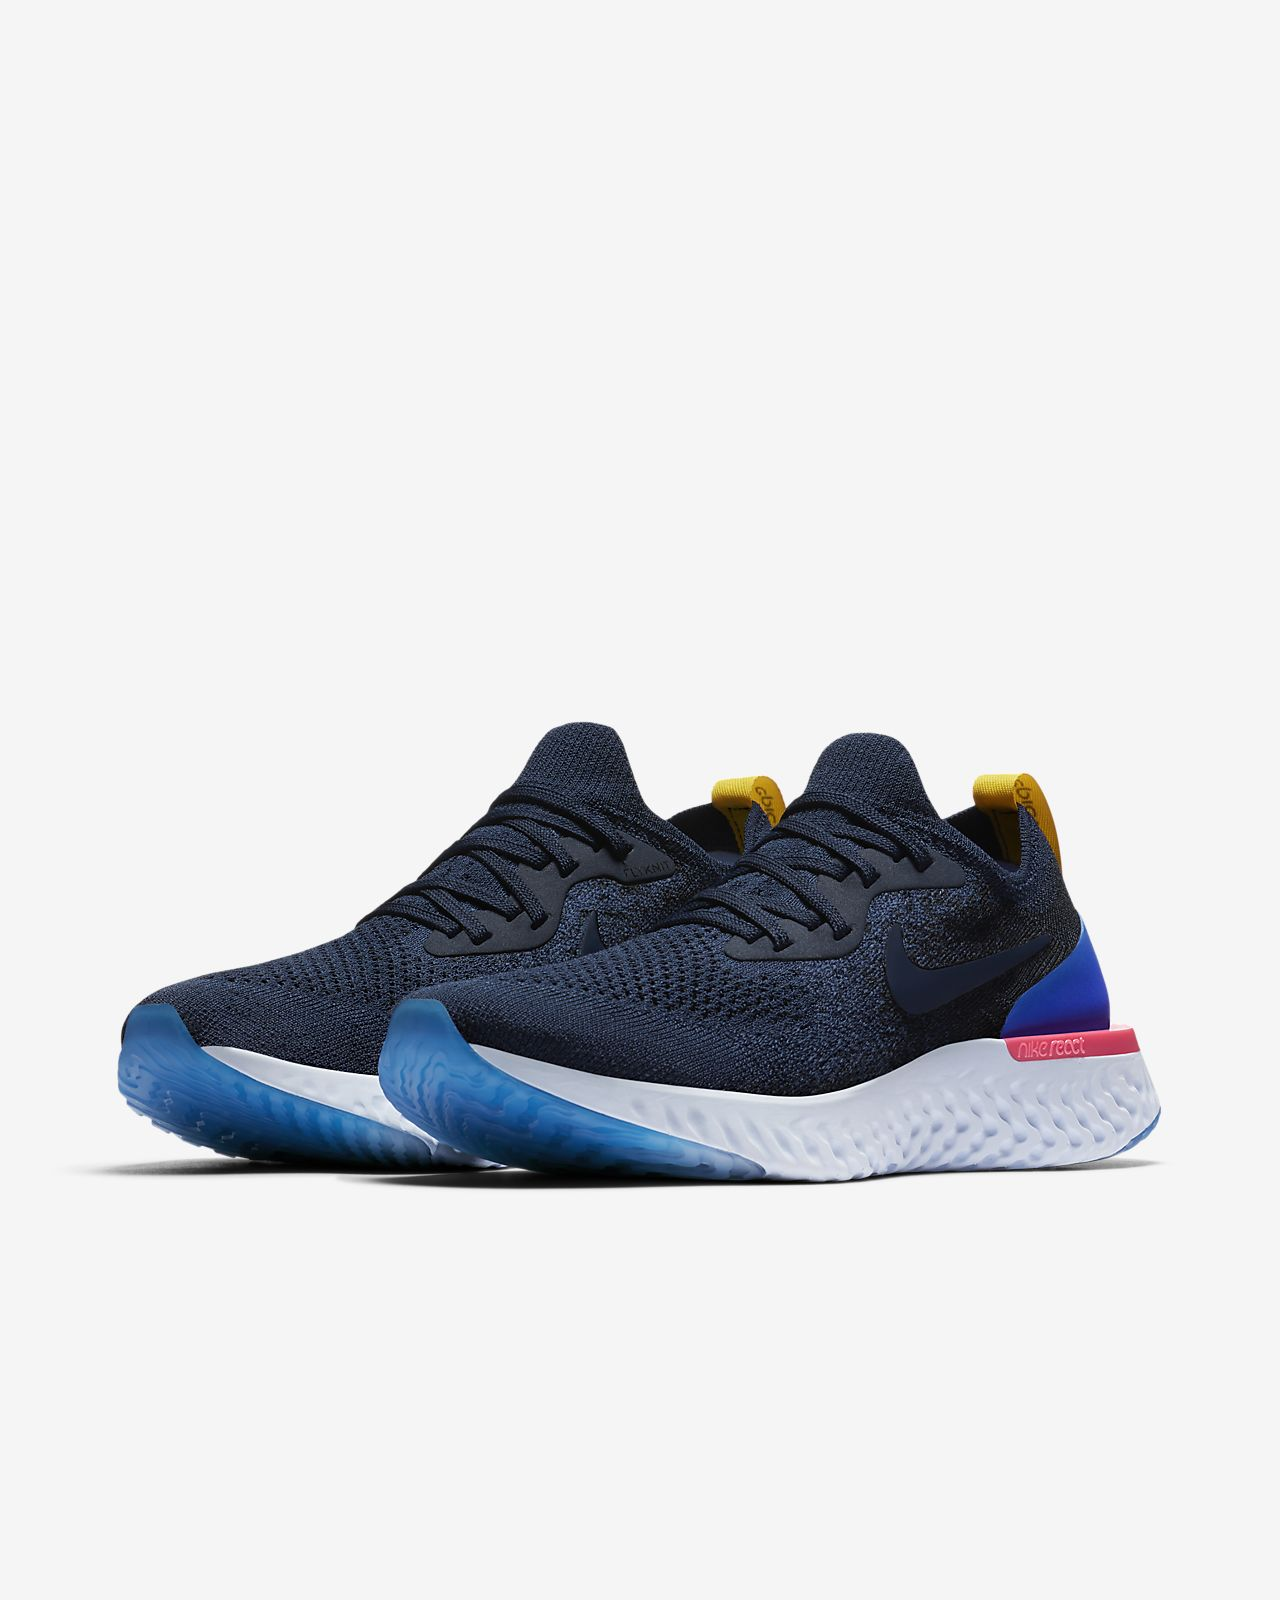 new products 47104 599ce ... switzerland nike epic react flyknit nike epic react flyknit womens  running shoe 4d3de 54a0e